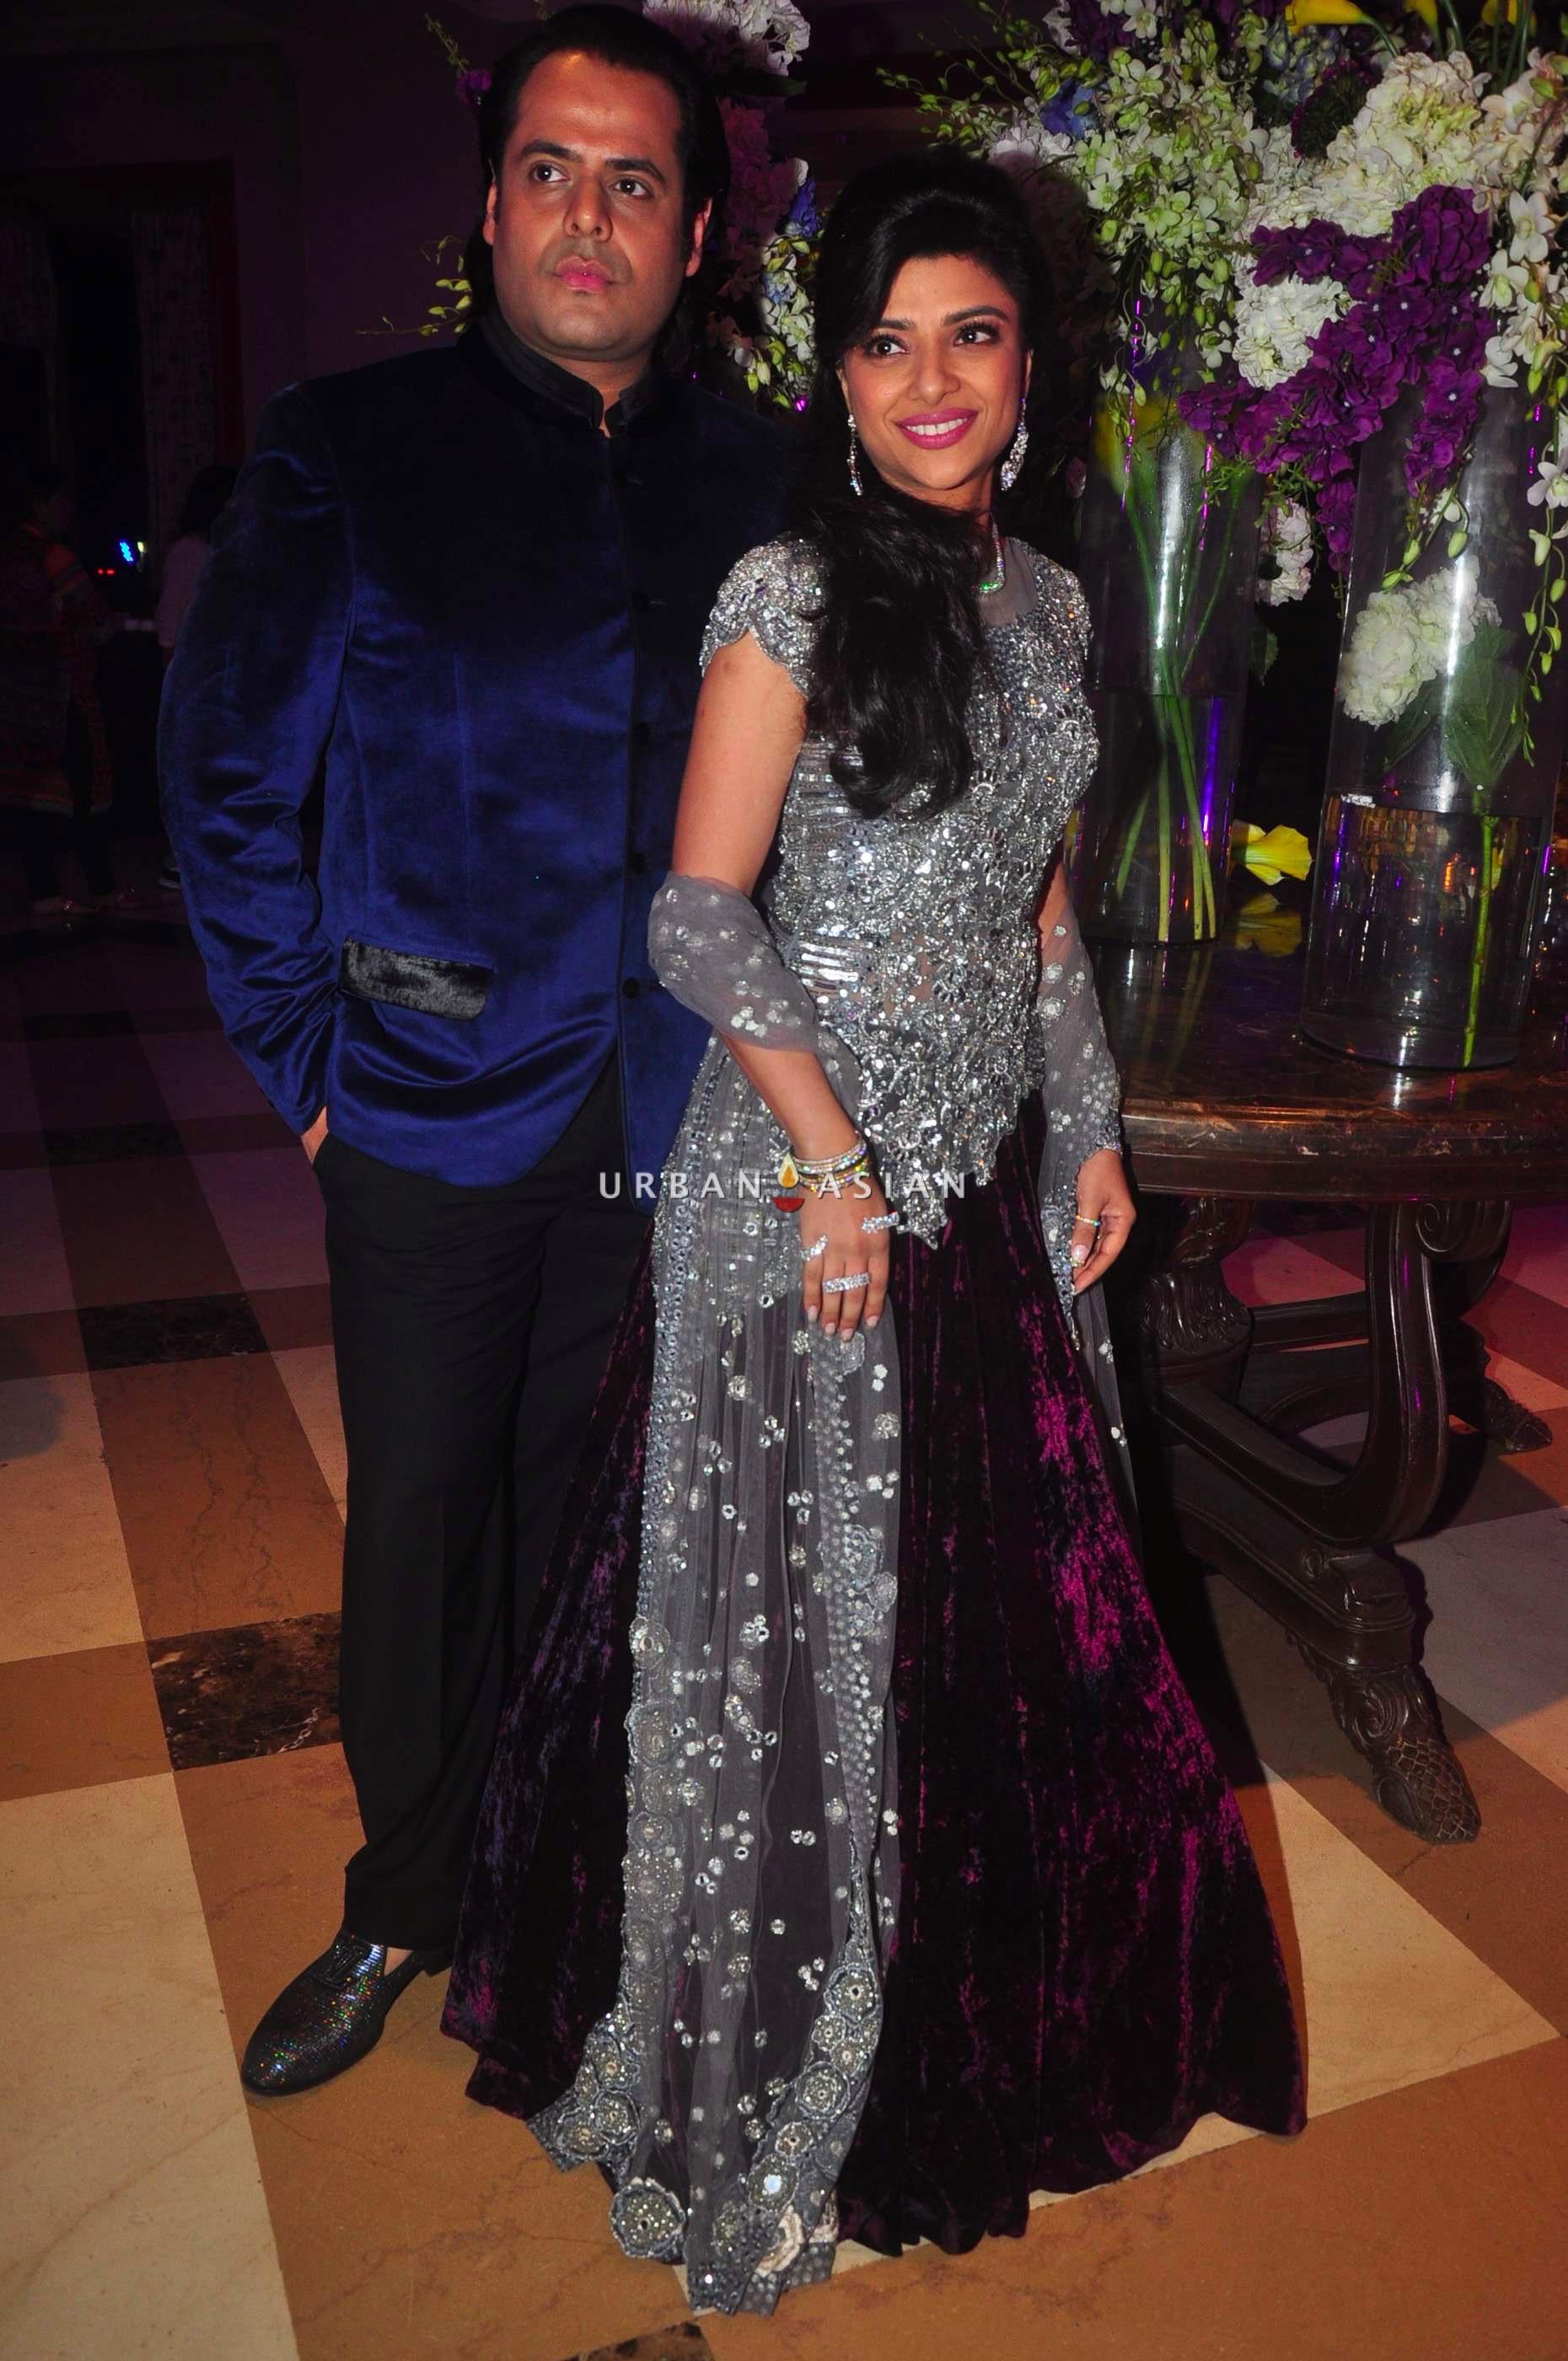 Uday Singh and Shirin